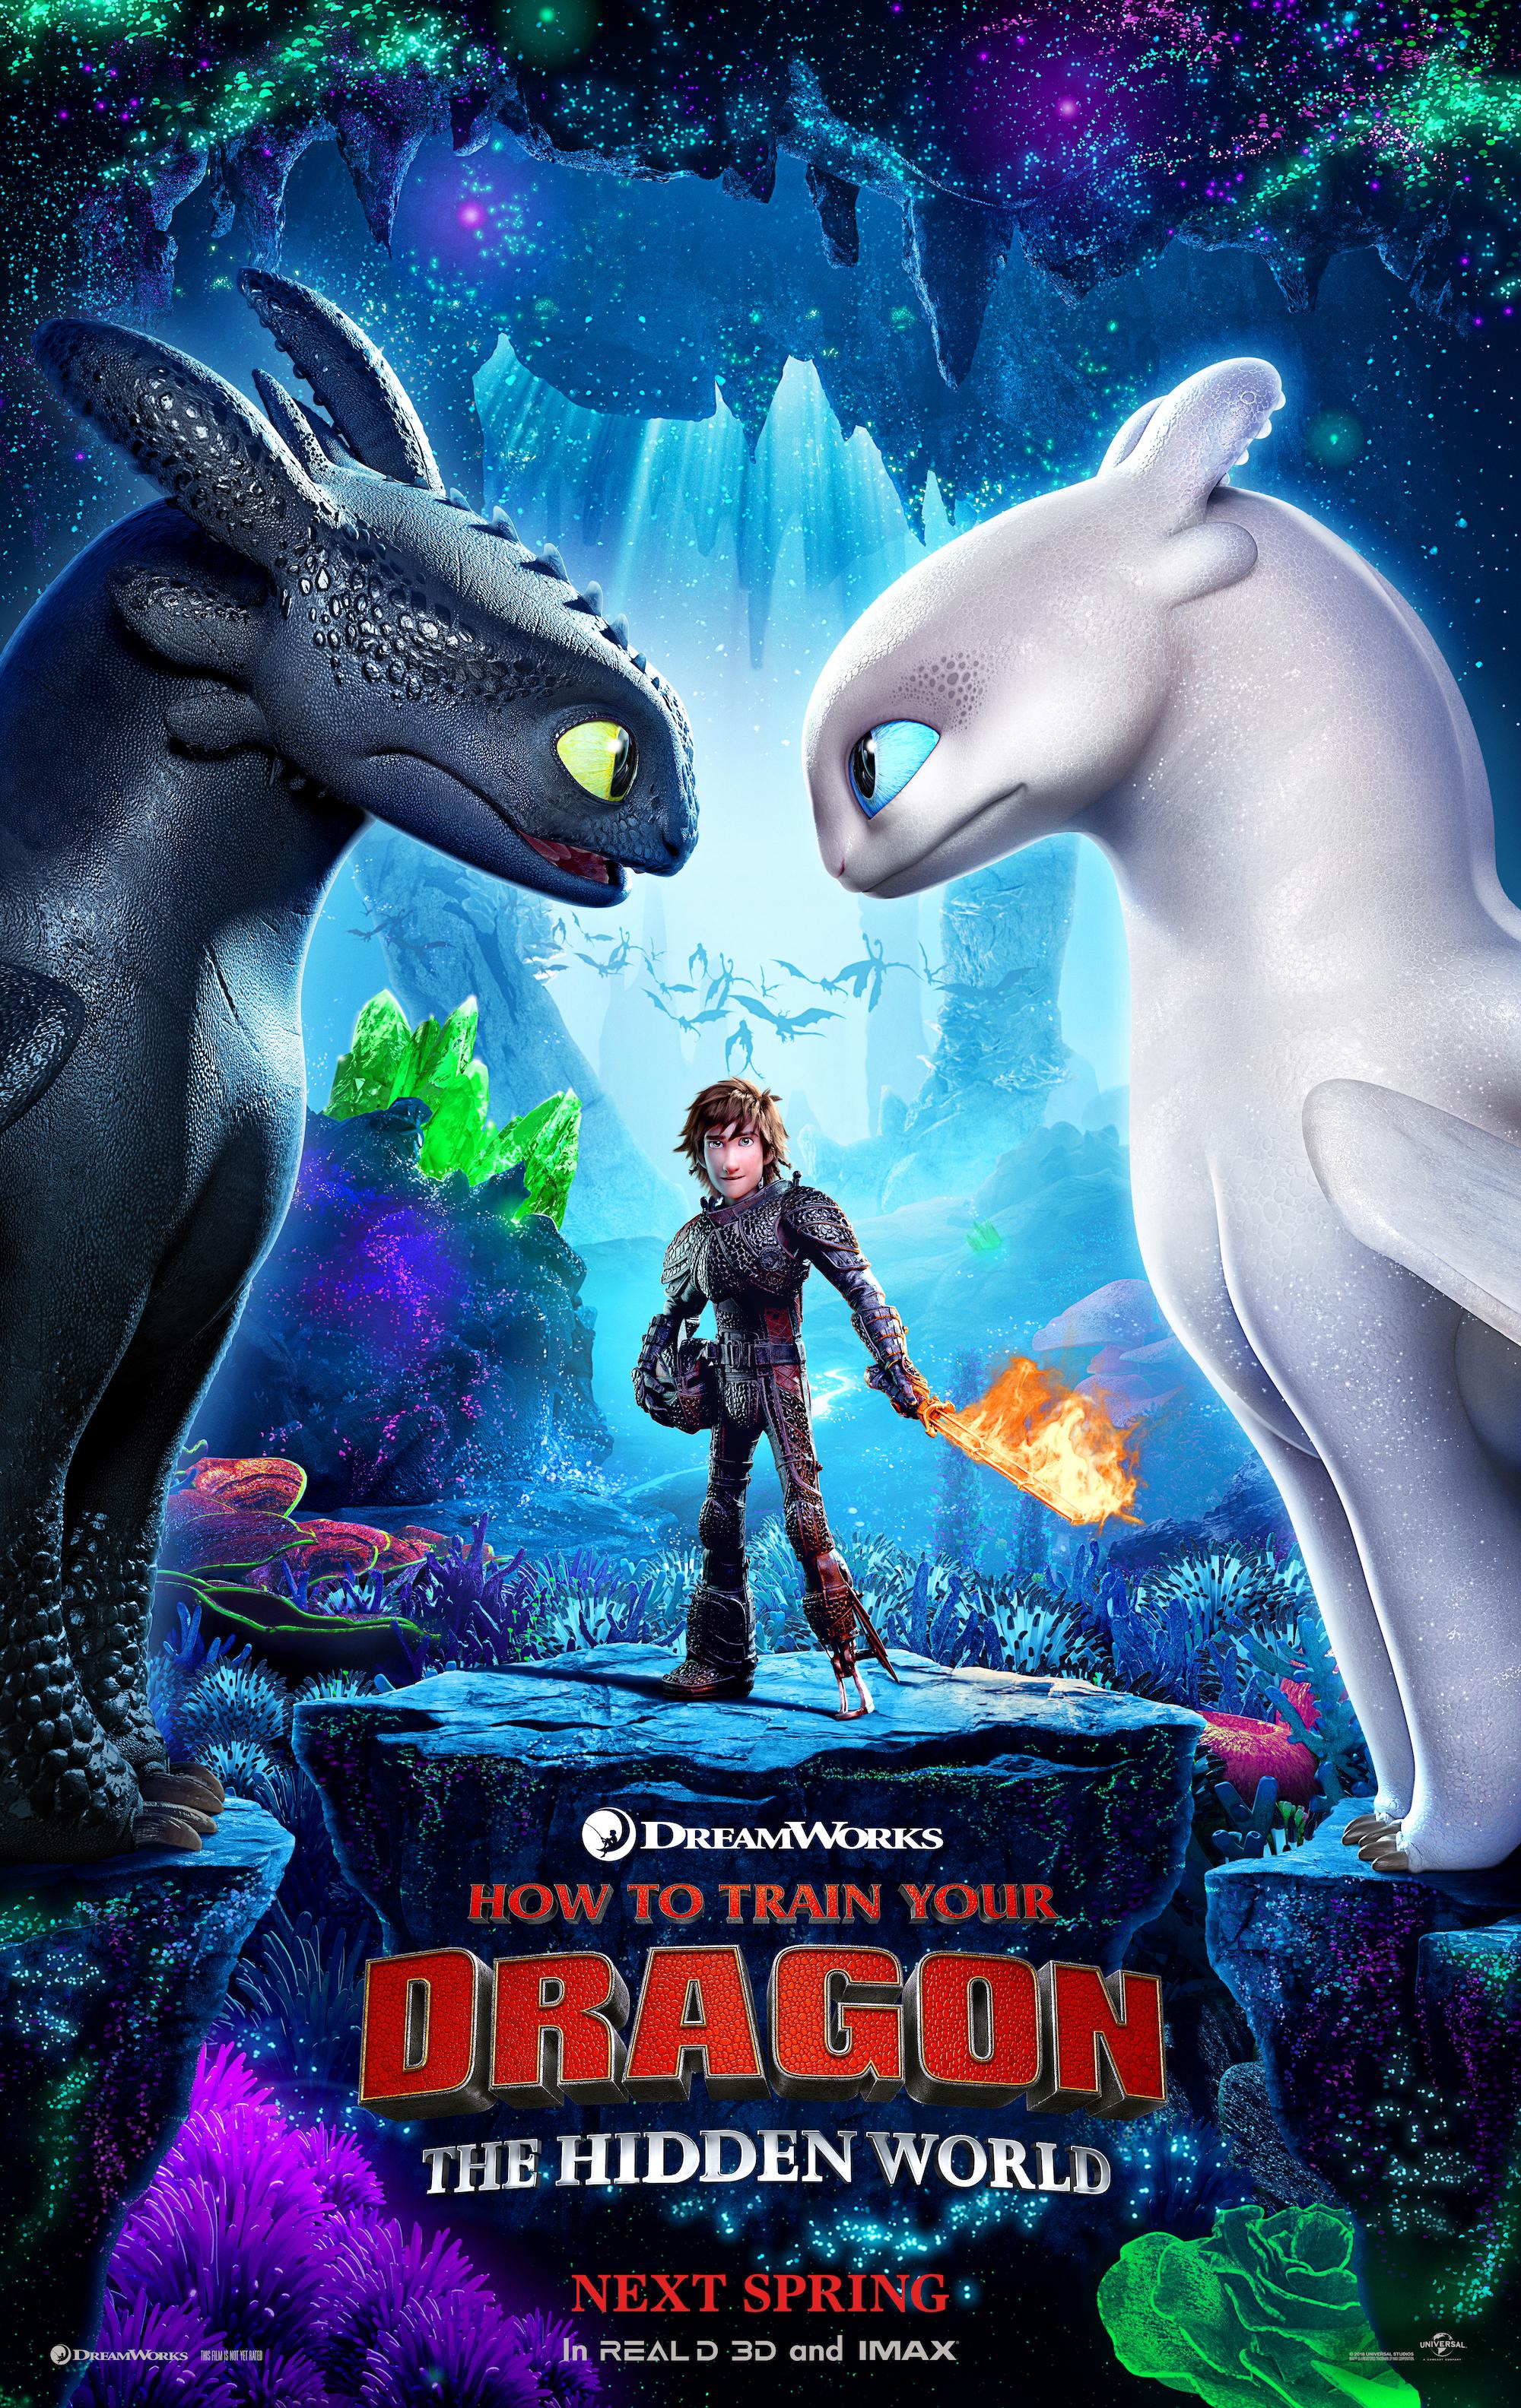 how-to-train-your-dragon-the-hidden-world-3-d-3d.jpg